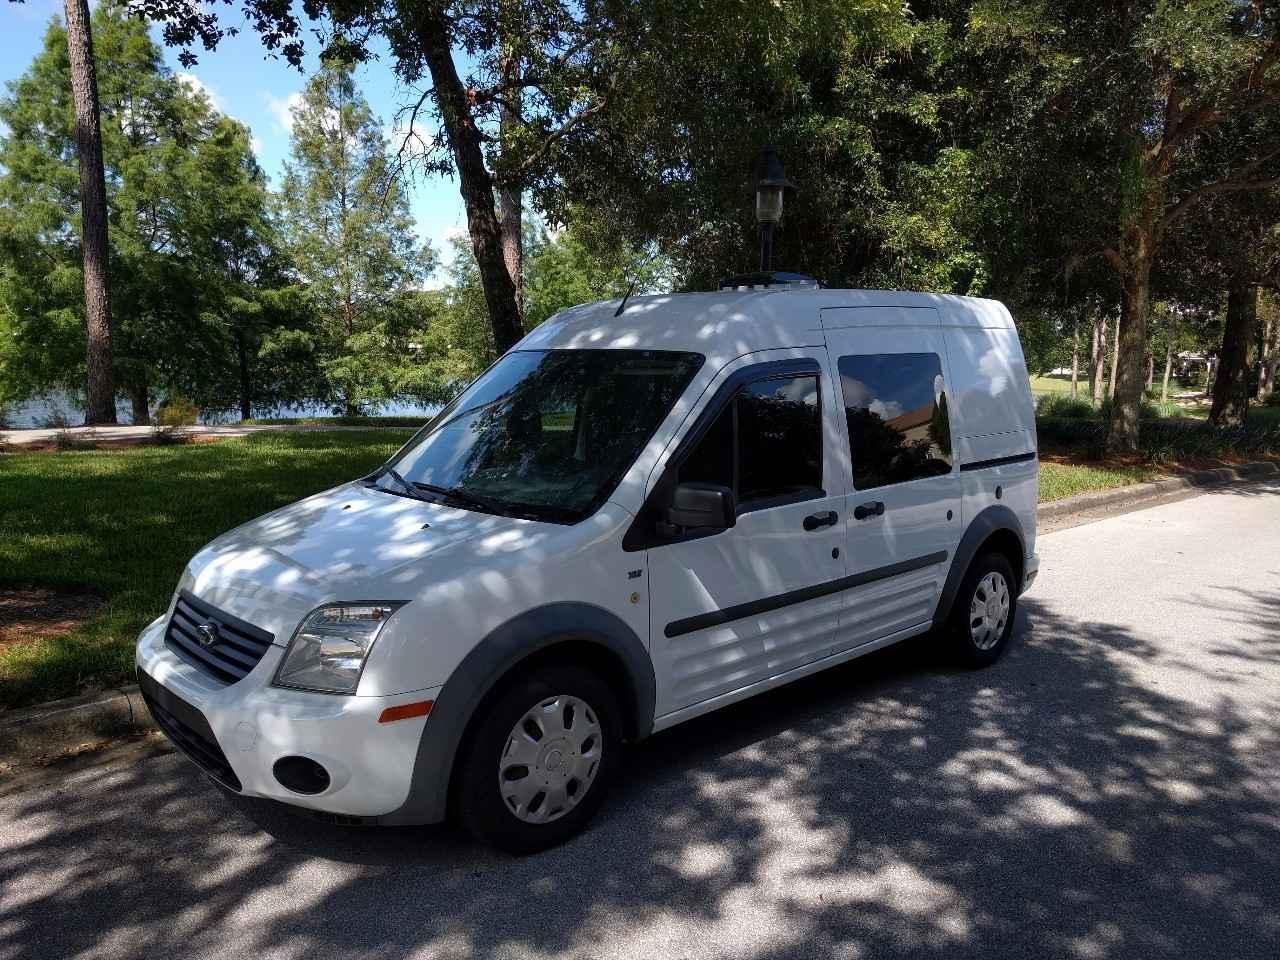 2013 used ford transit connect campervan class b in florida fl. Black Bedroom Furniture Sets. Home Design Ideas